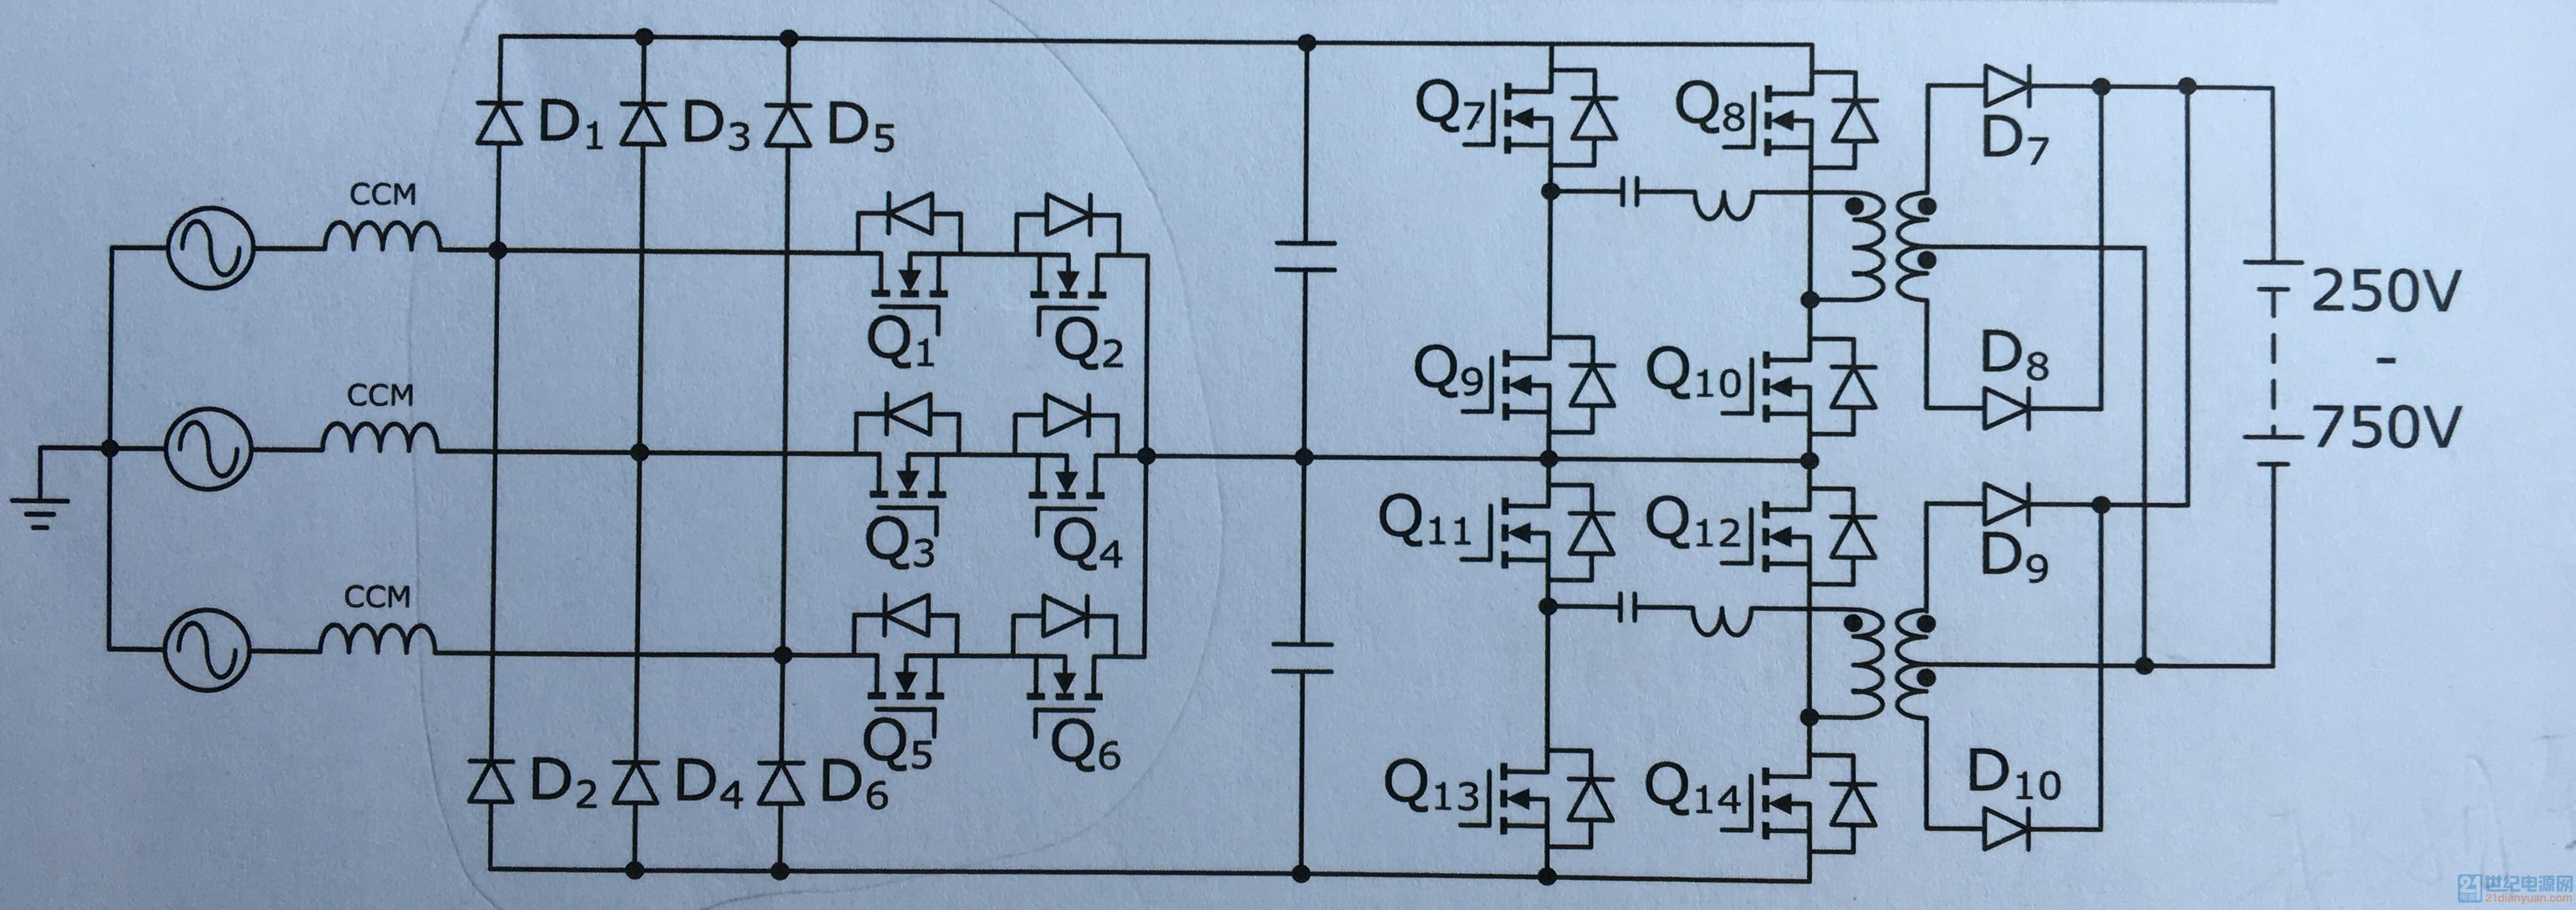 15kw充电桩典型拓扑结构